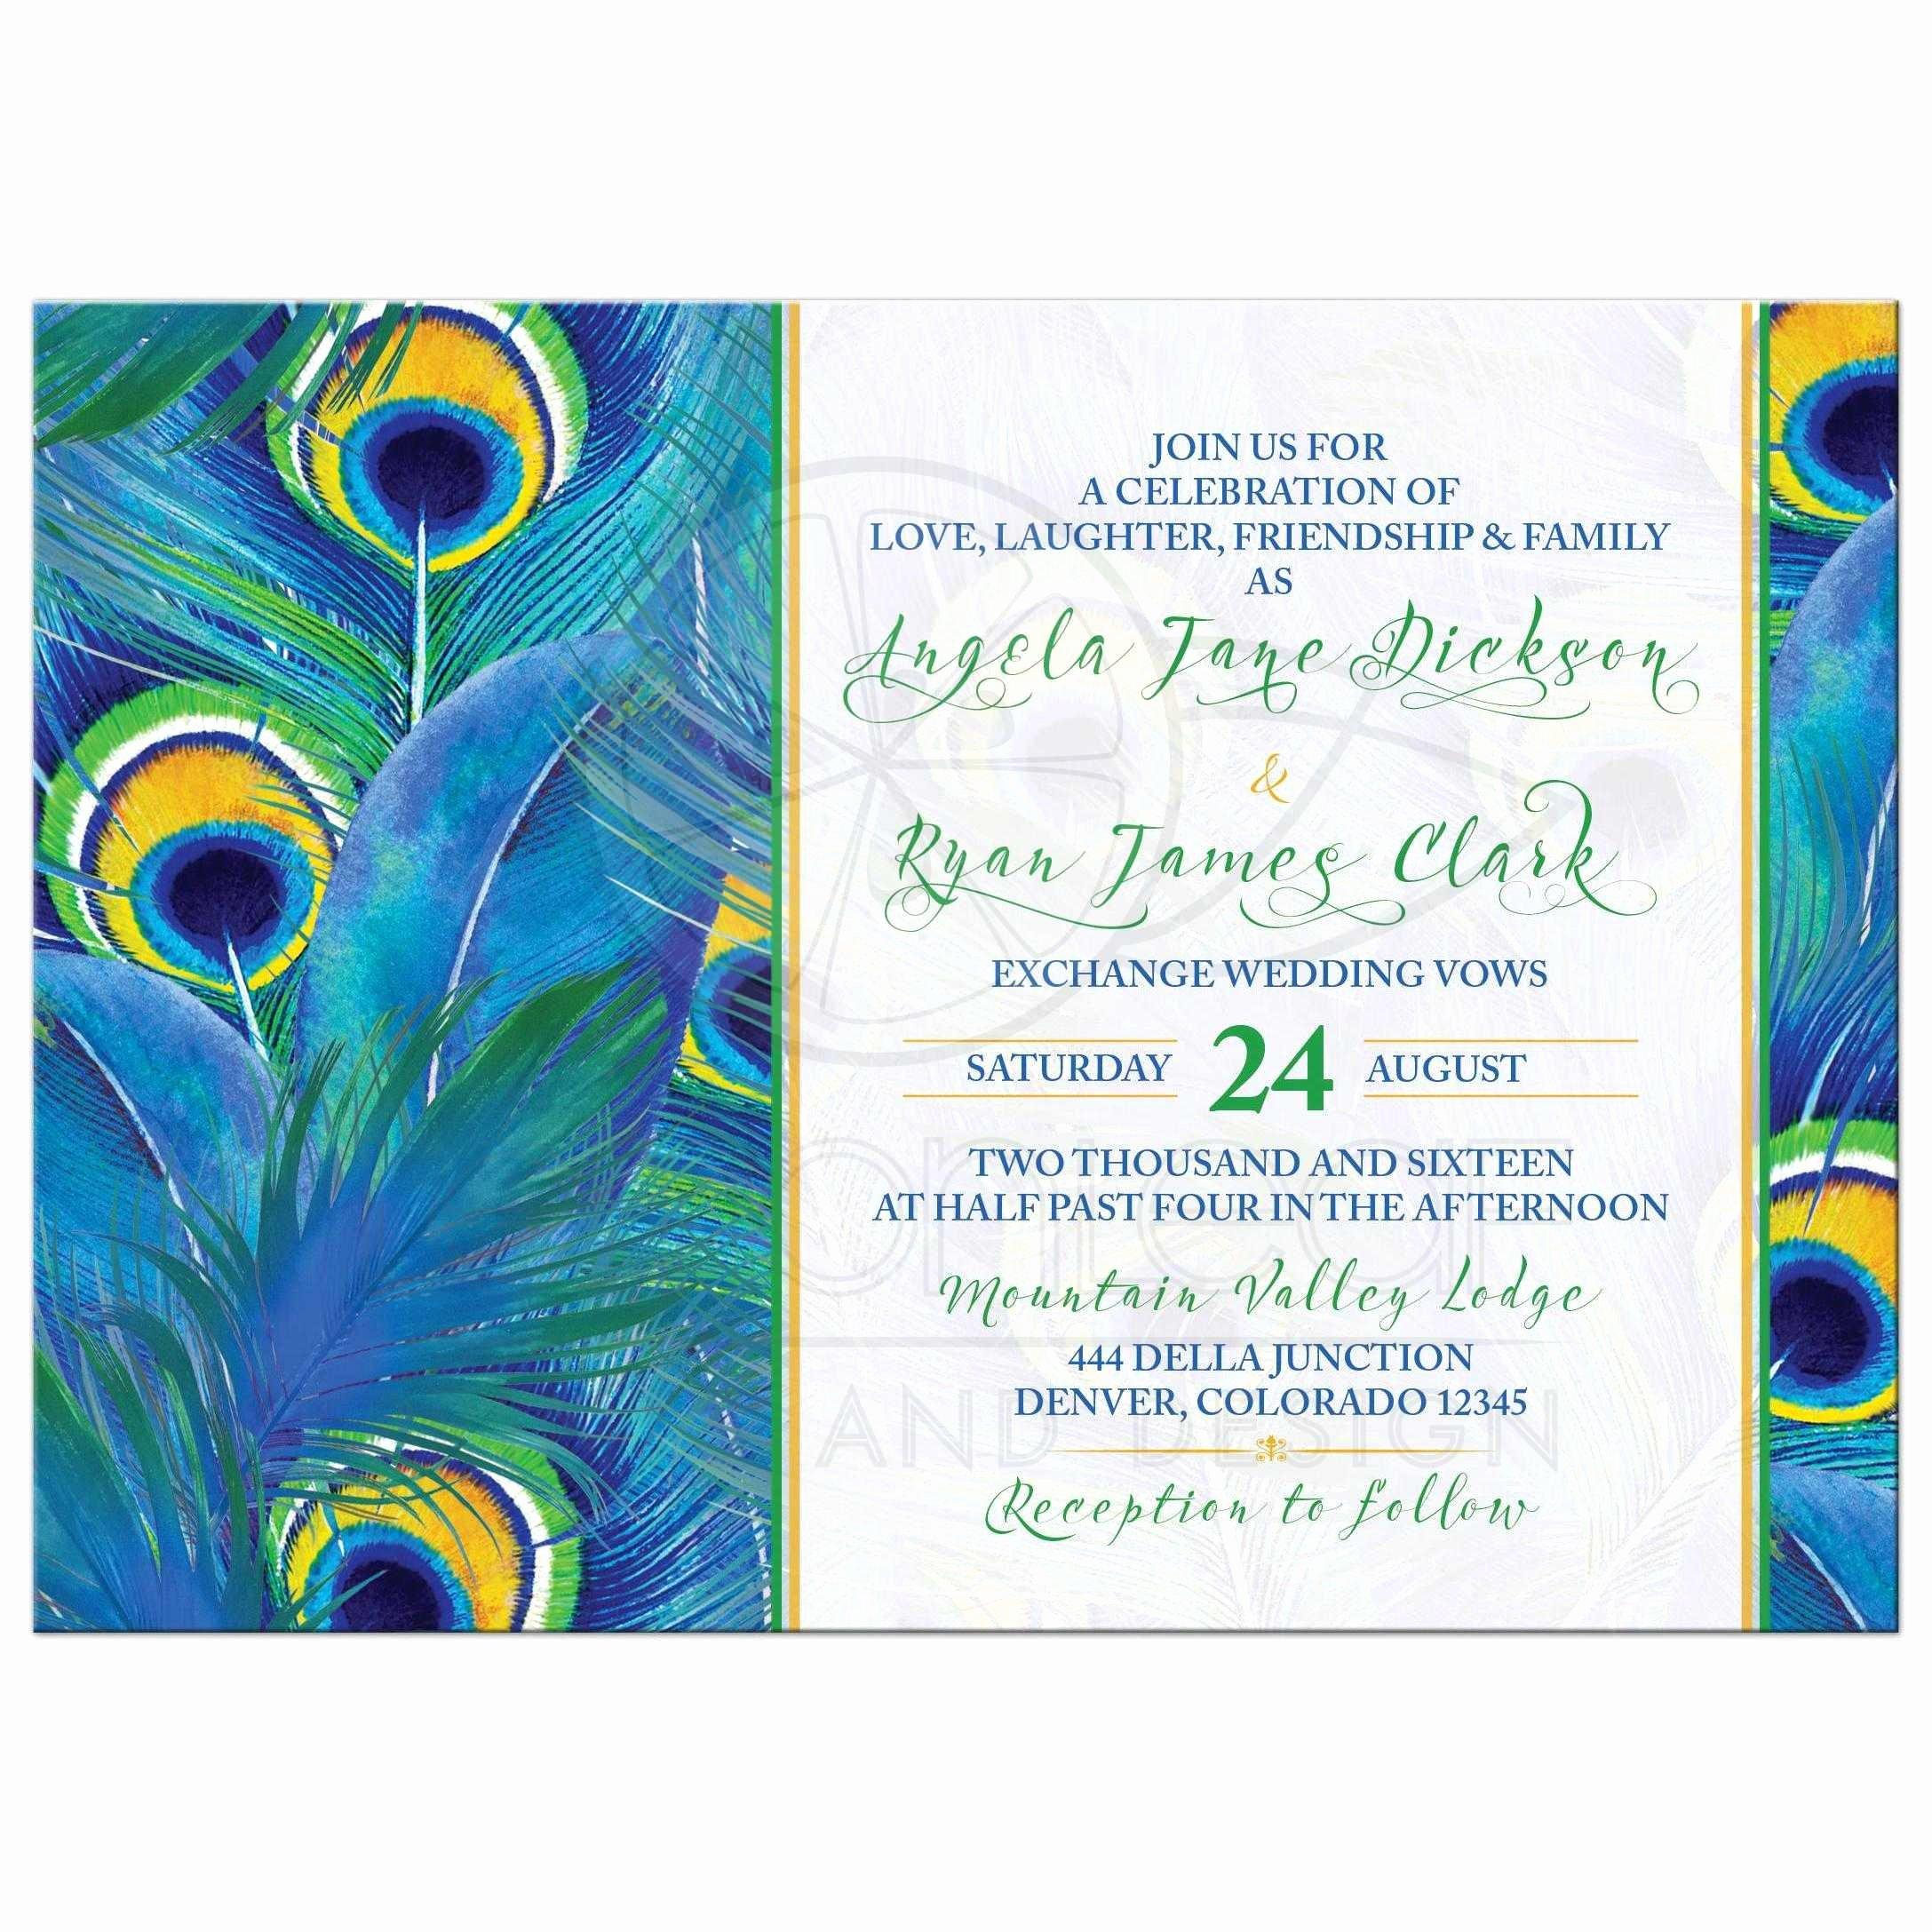 Peacock Invitation Cards Peacock Wedding Invites Etsy